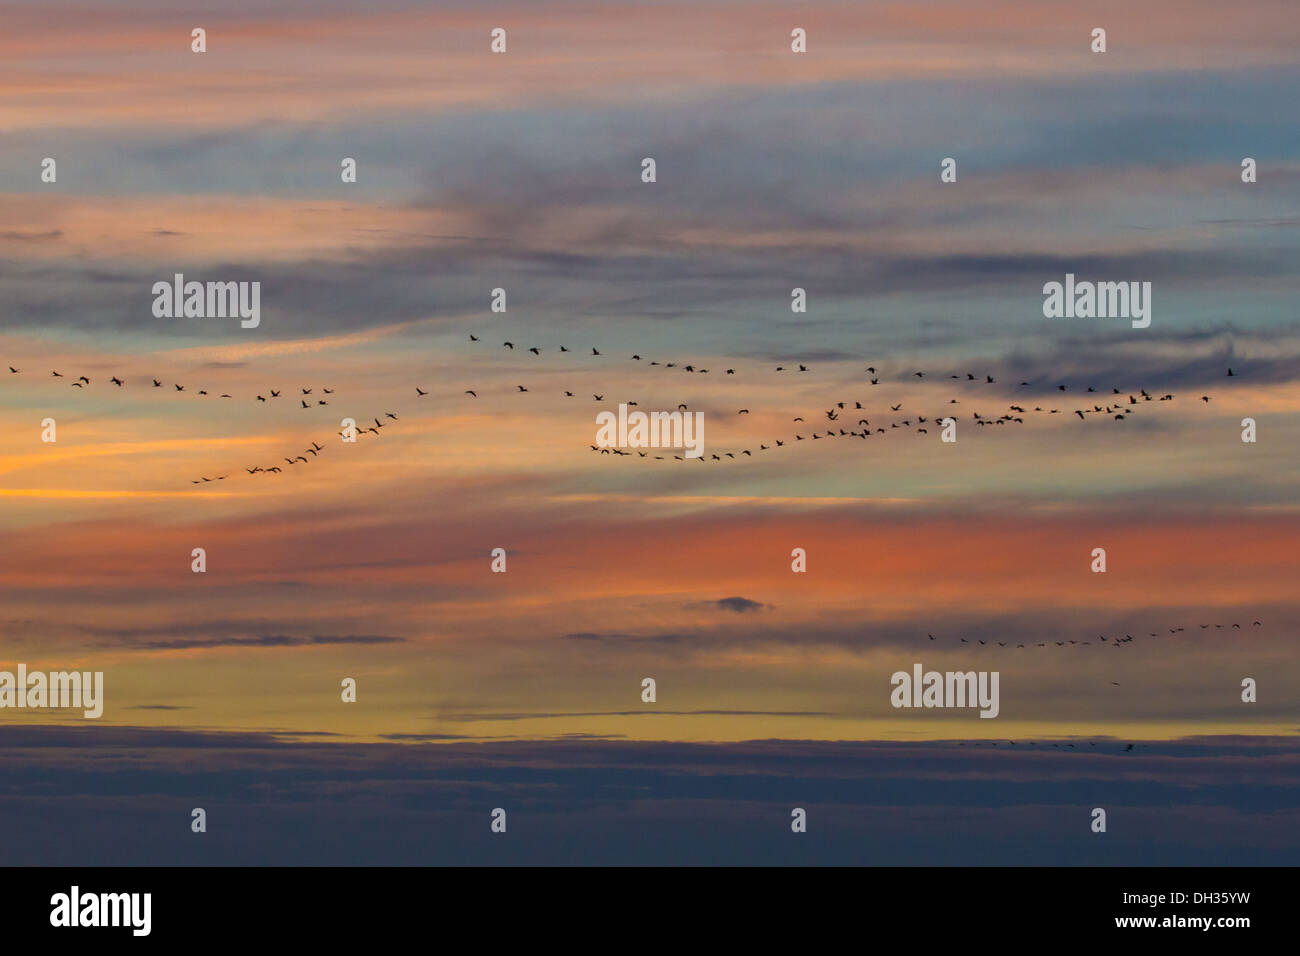 Bird migration of crane - Stock Image